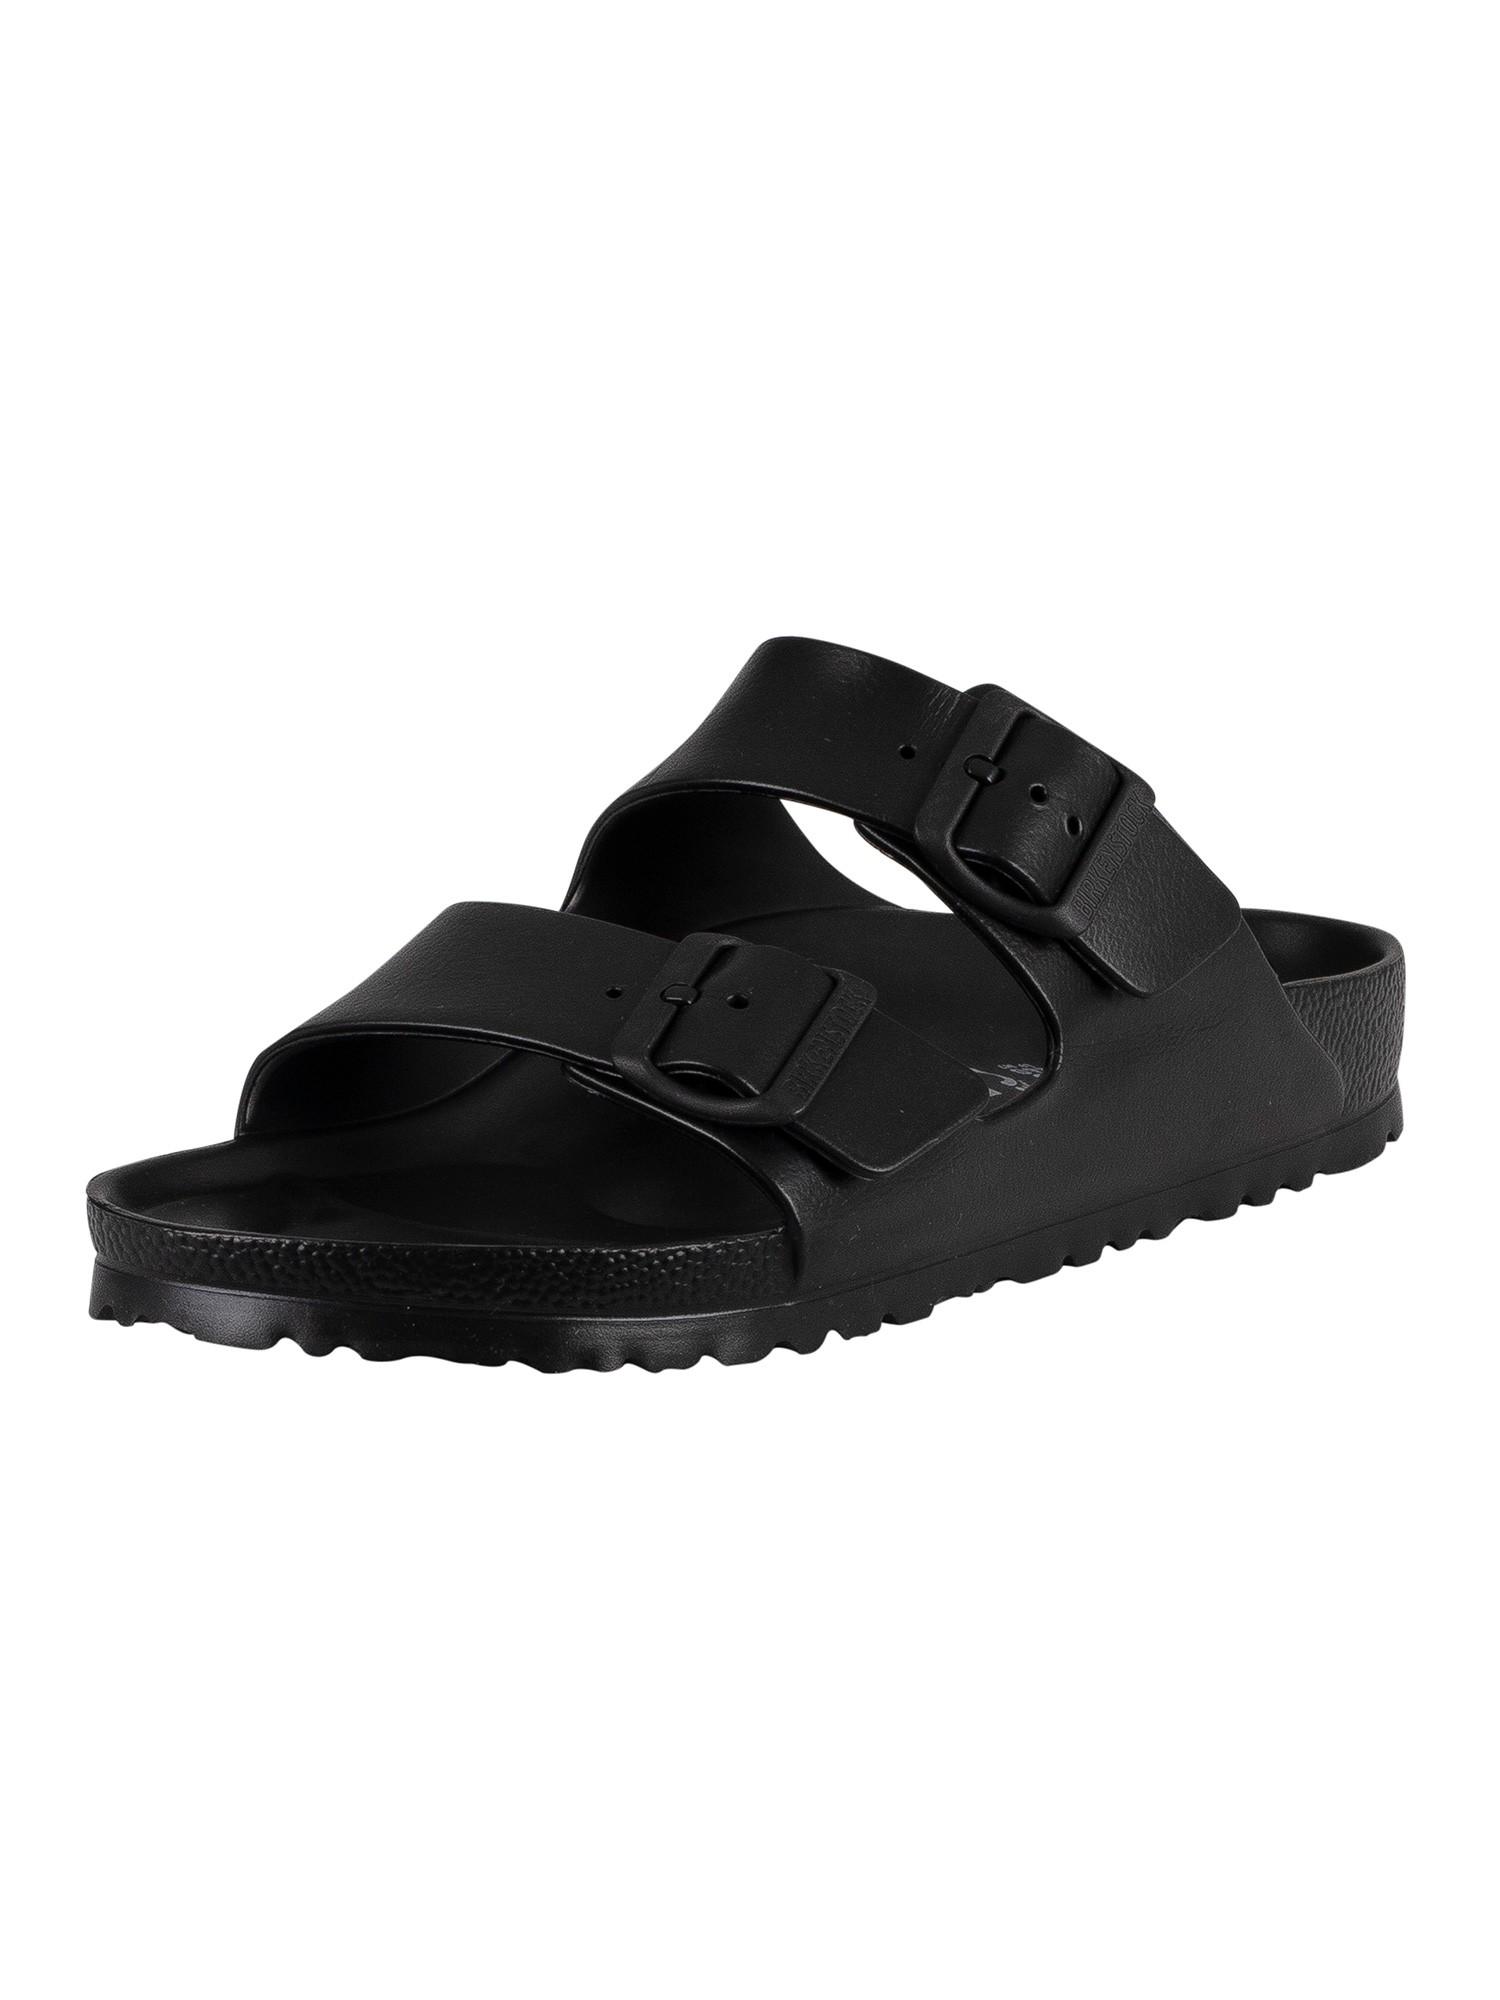 Narrow-Fit-Arizona-EVA-Sandals